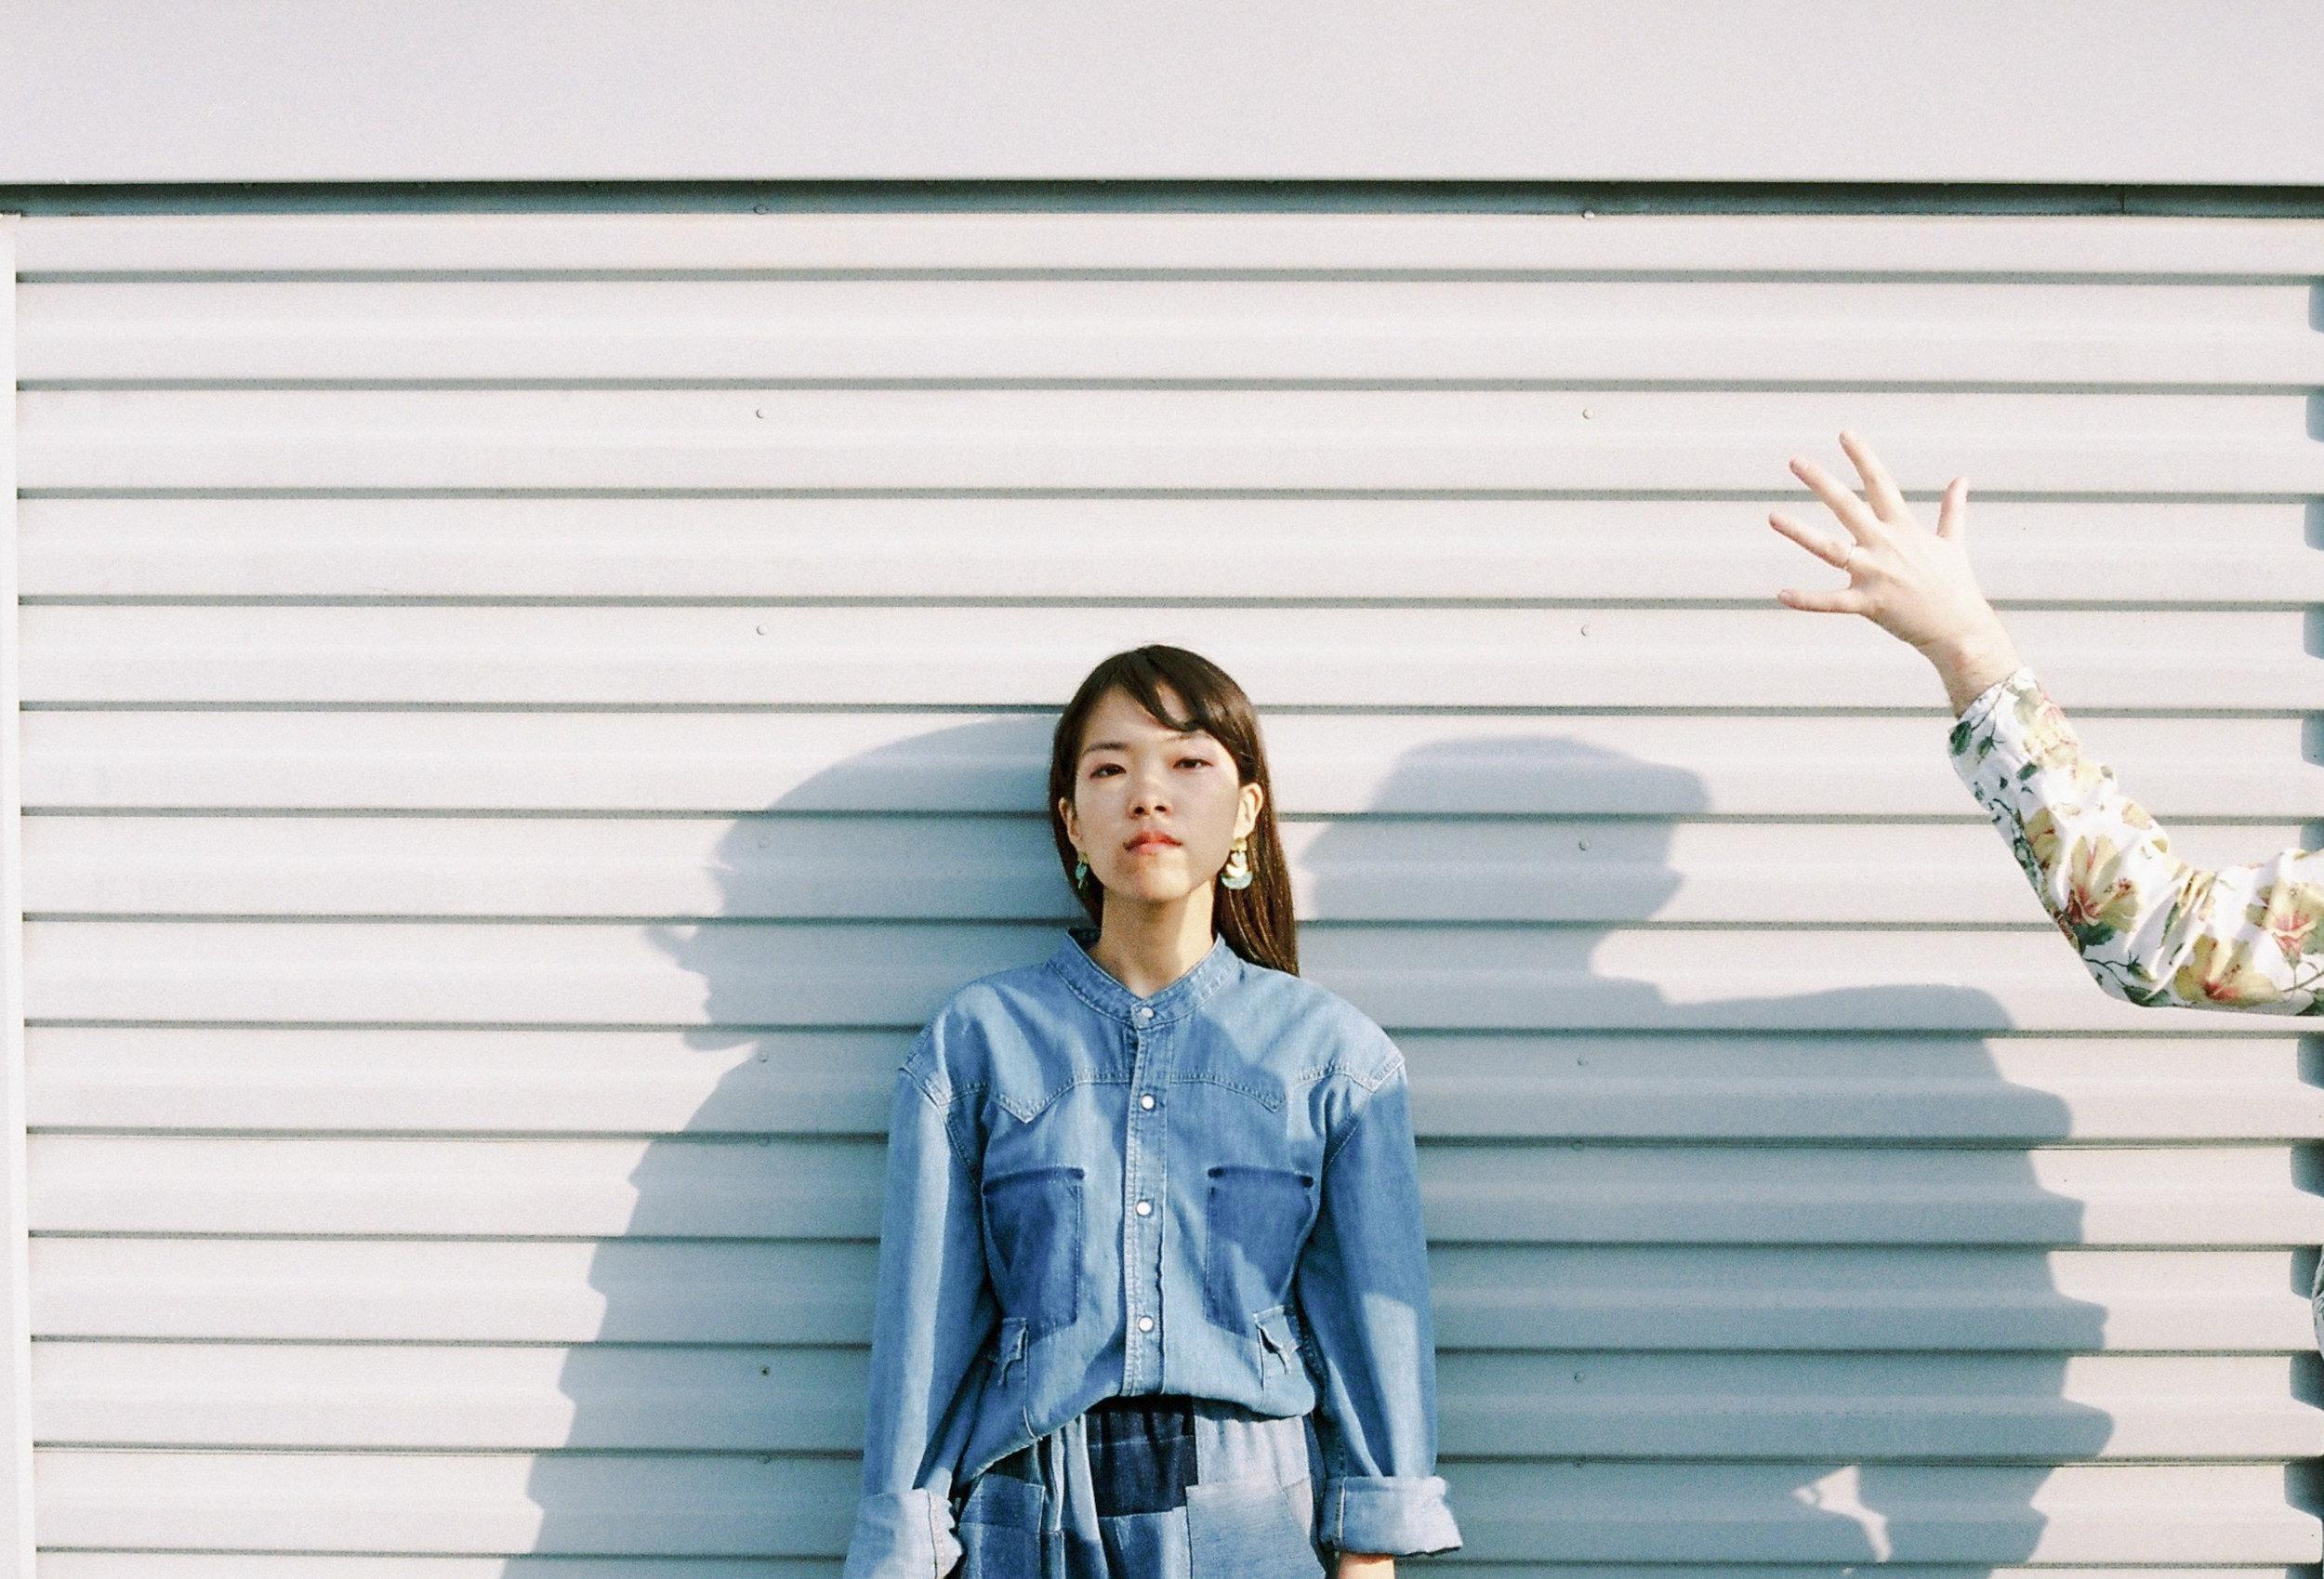 Miharu Matsunaga Hami - Art director, Designer